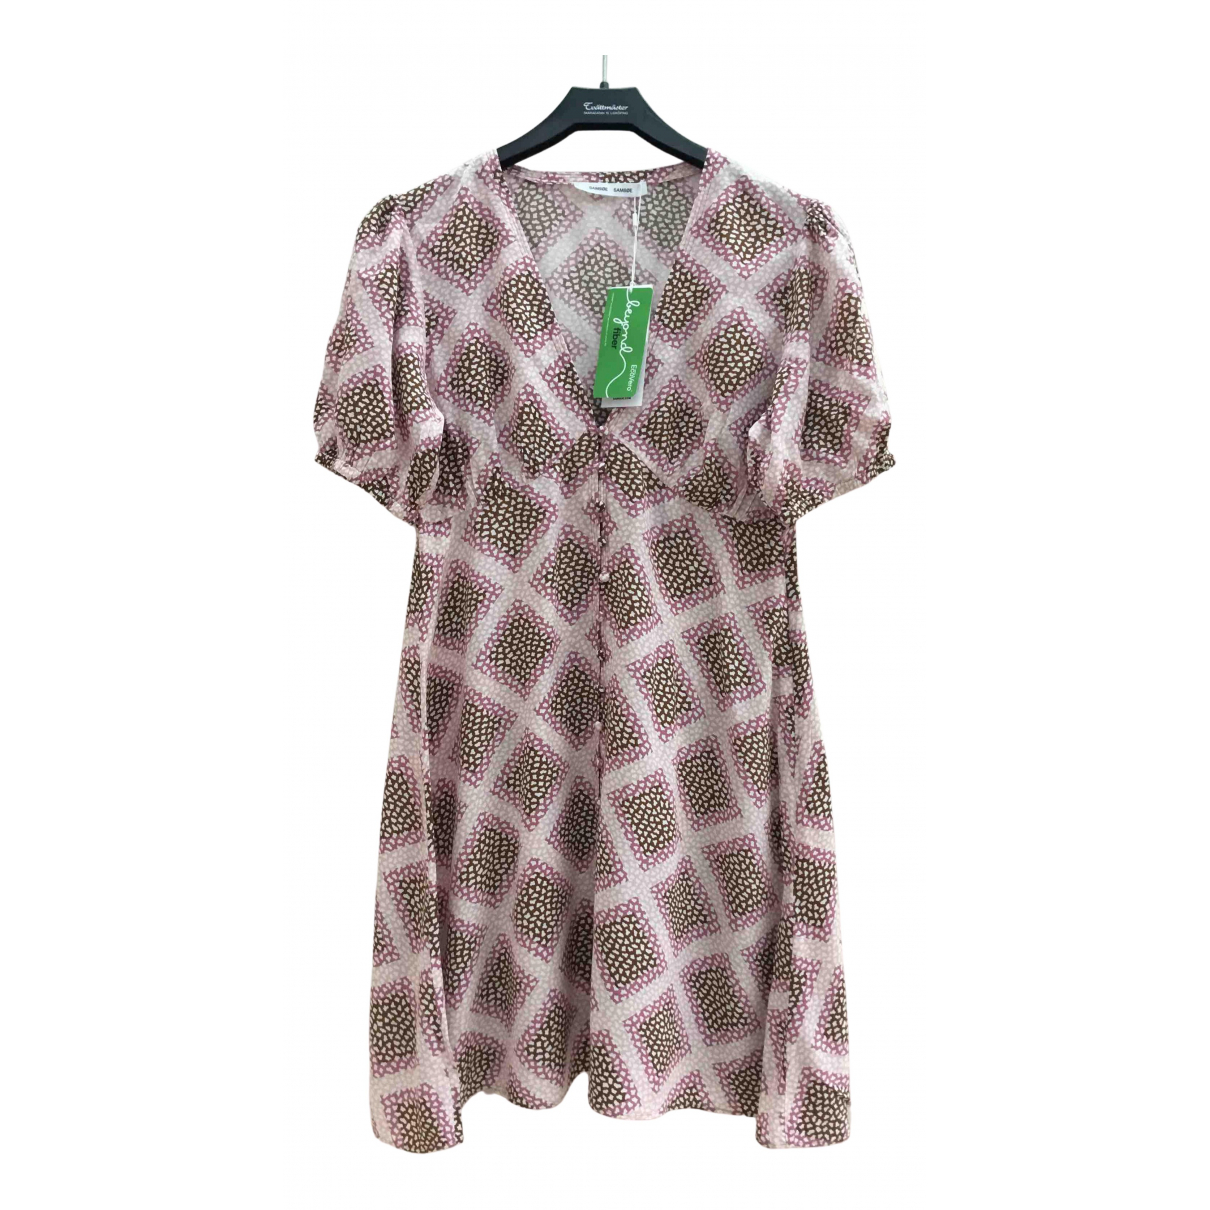 Samsoe & Samsoe N Pink dress for Women M International